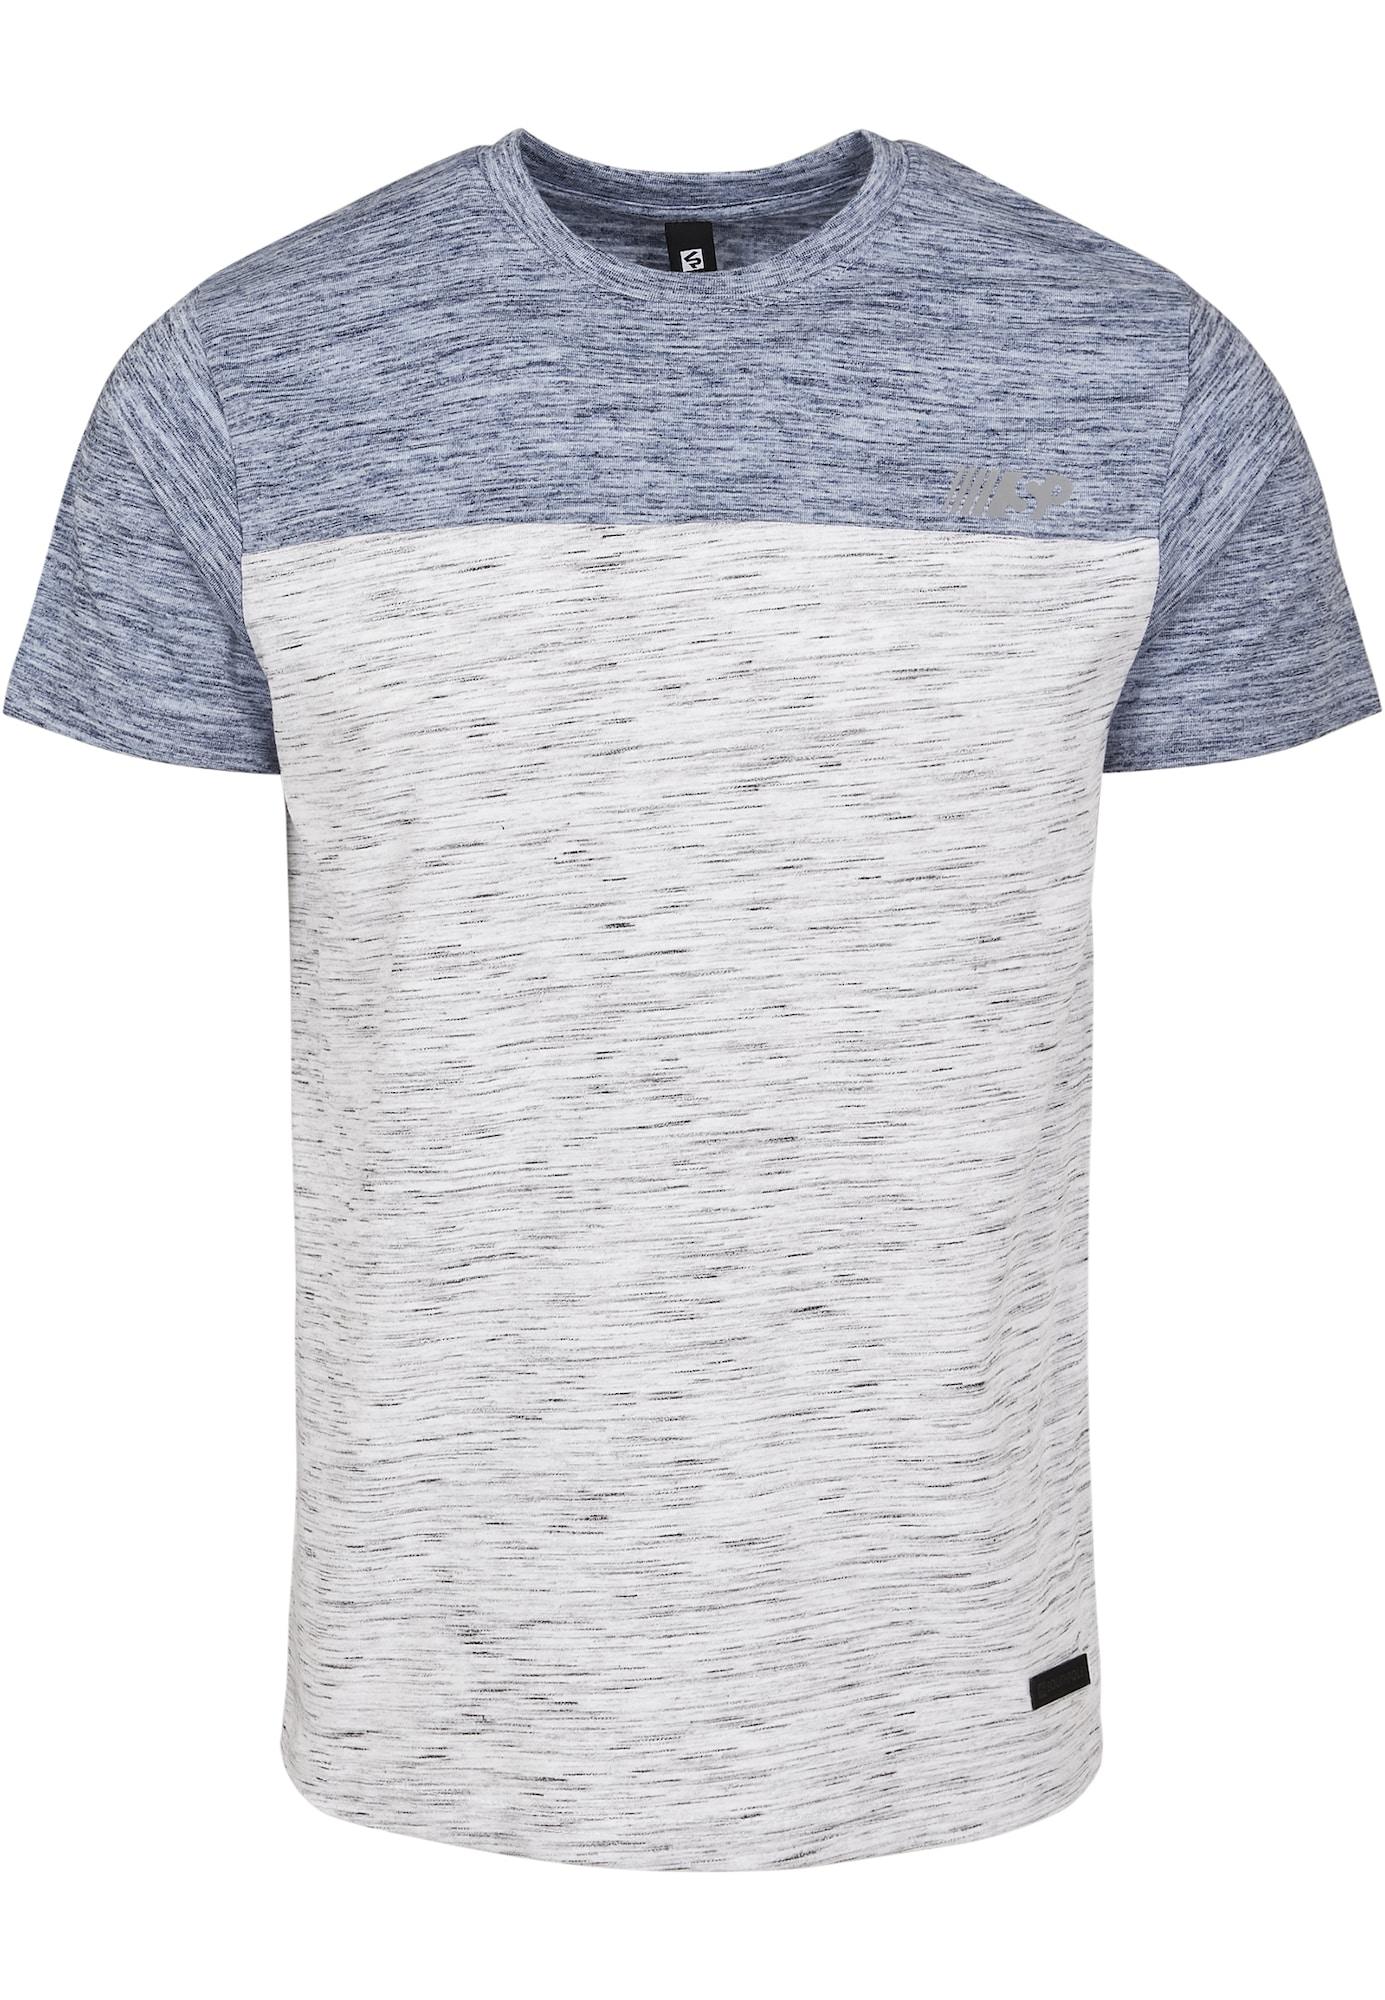 SOUTHPOLE Marškinėliai margai balta / margai mėlyna